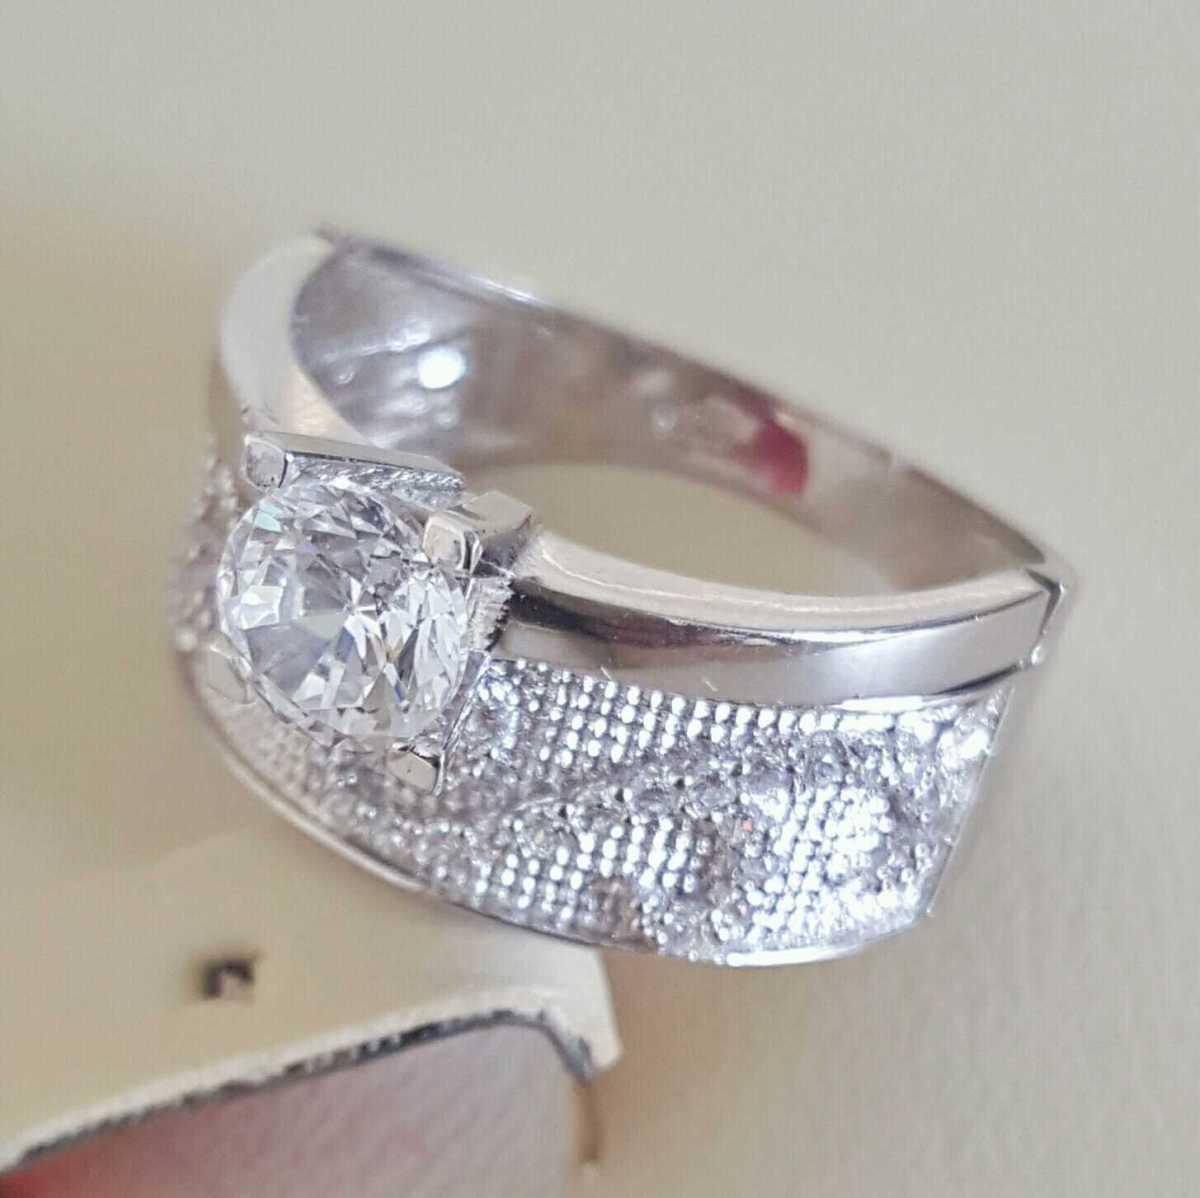 Real Silver 925 Jewellery Buy in Pakistan 1499 5 natural gemstones pakistan + 925 silver jewelry online